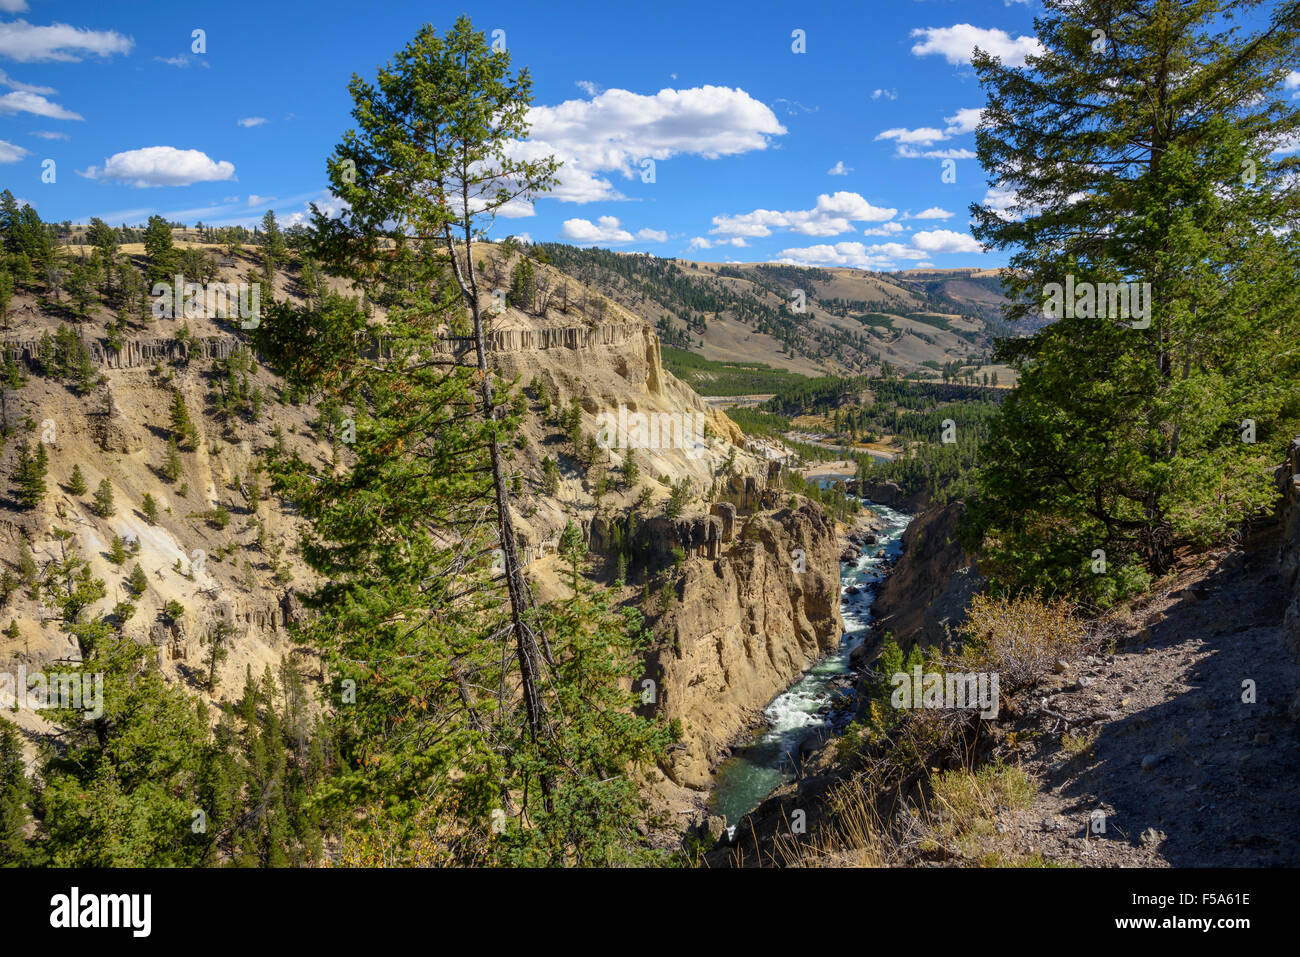 The Narrows, Yellowstone River, Yellowstone National Park, Wyoming, USA - Stock Image